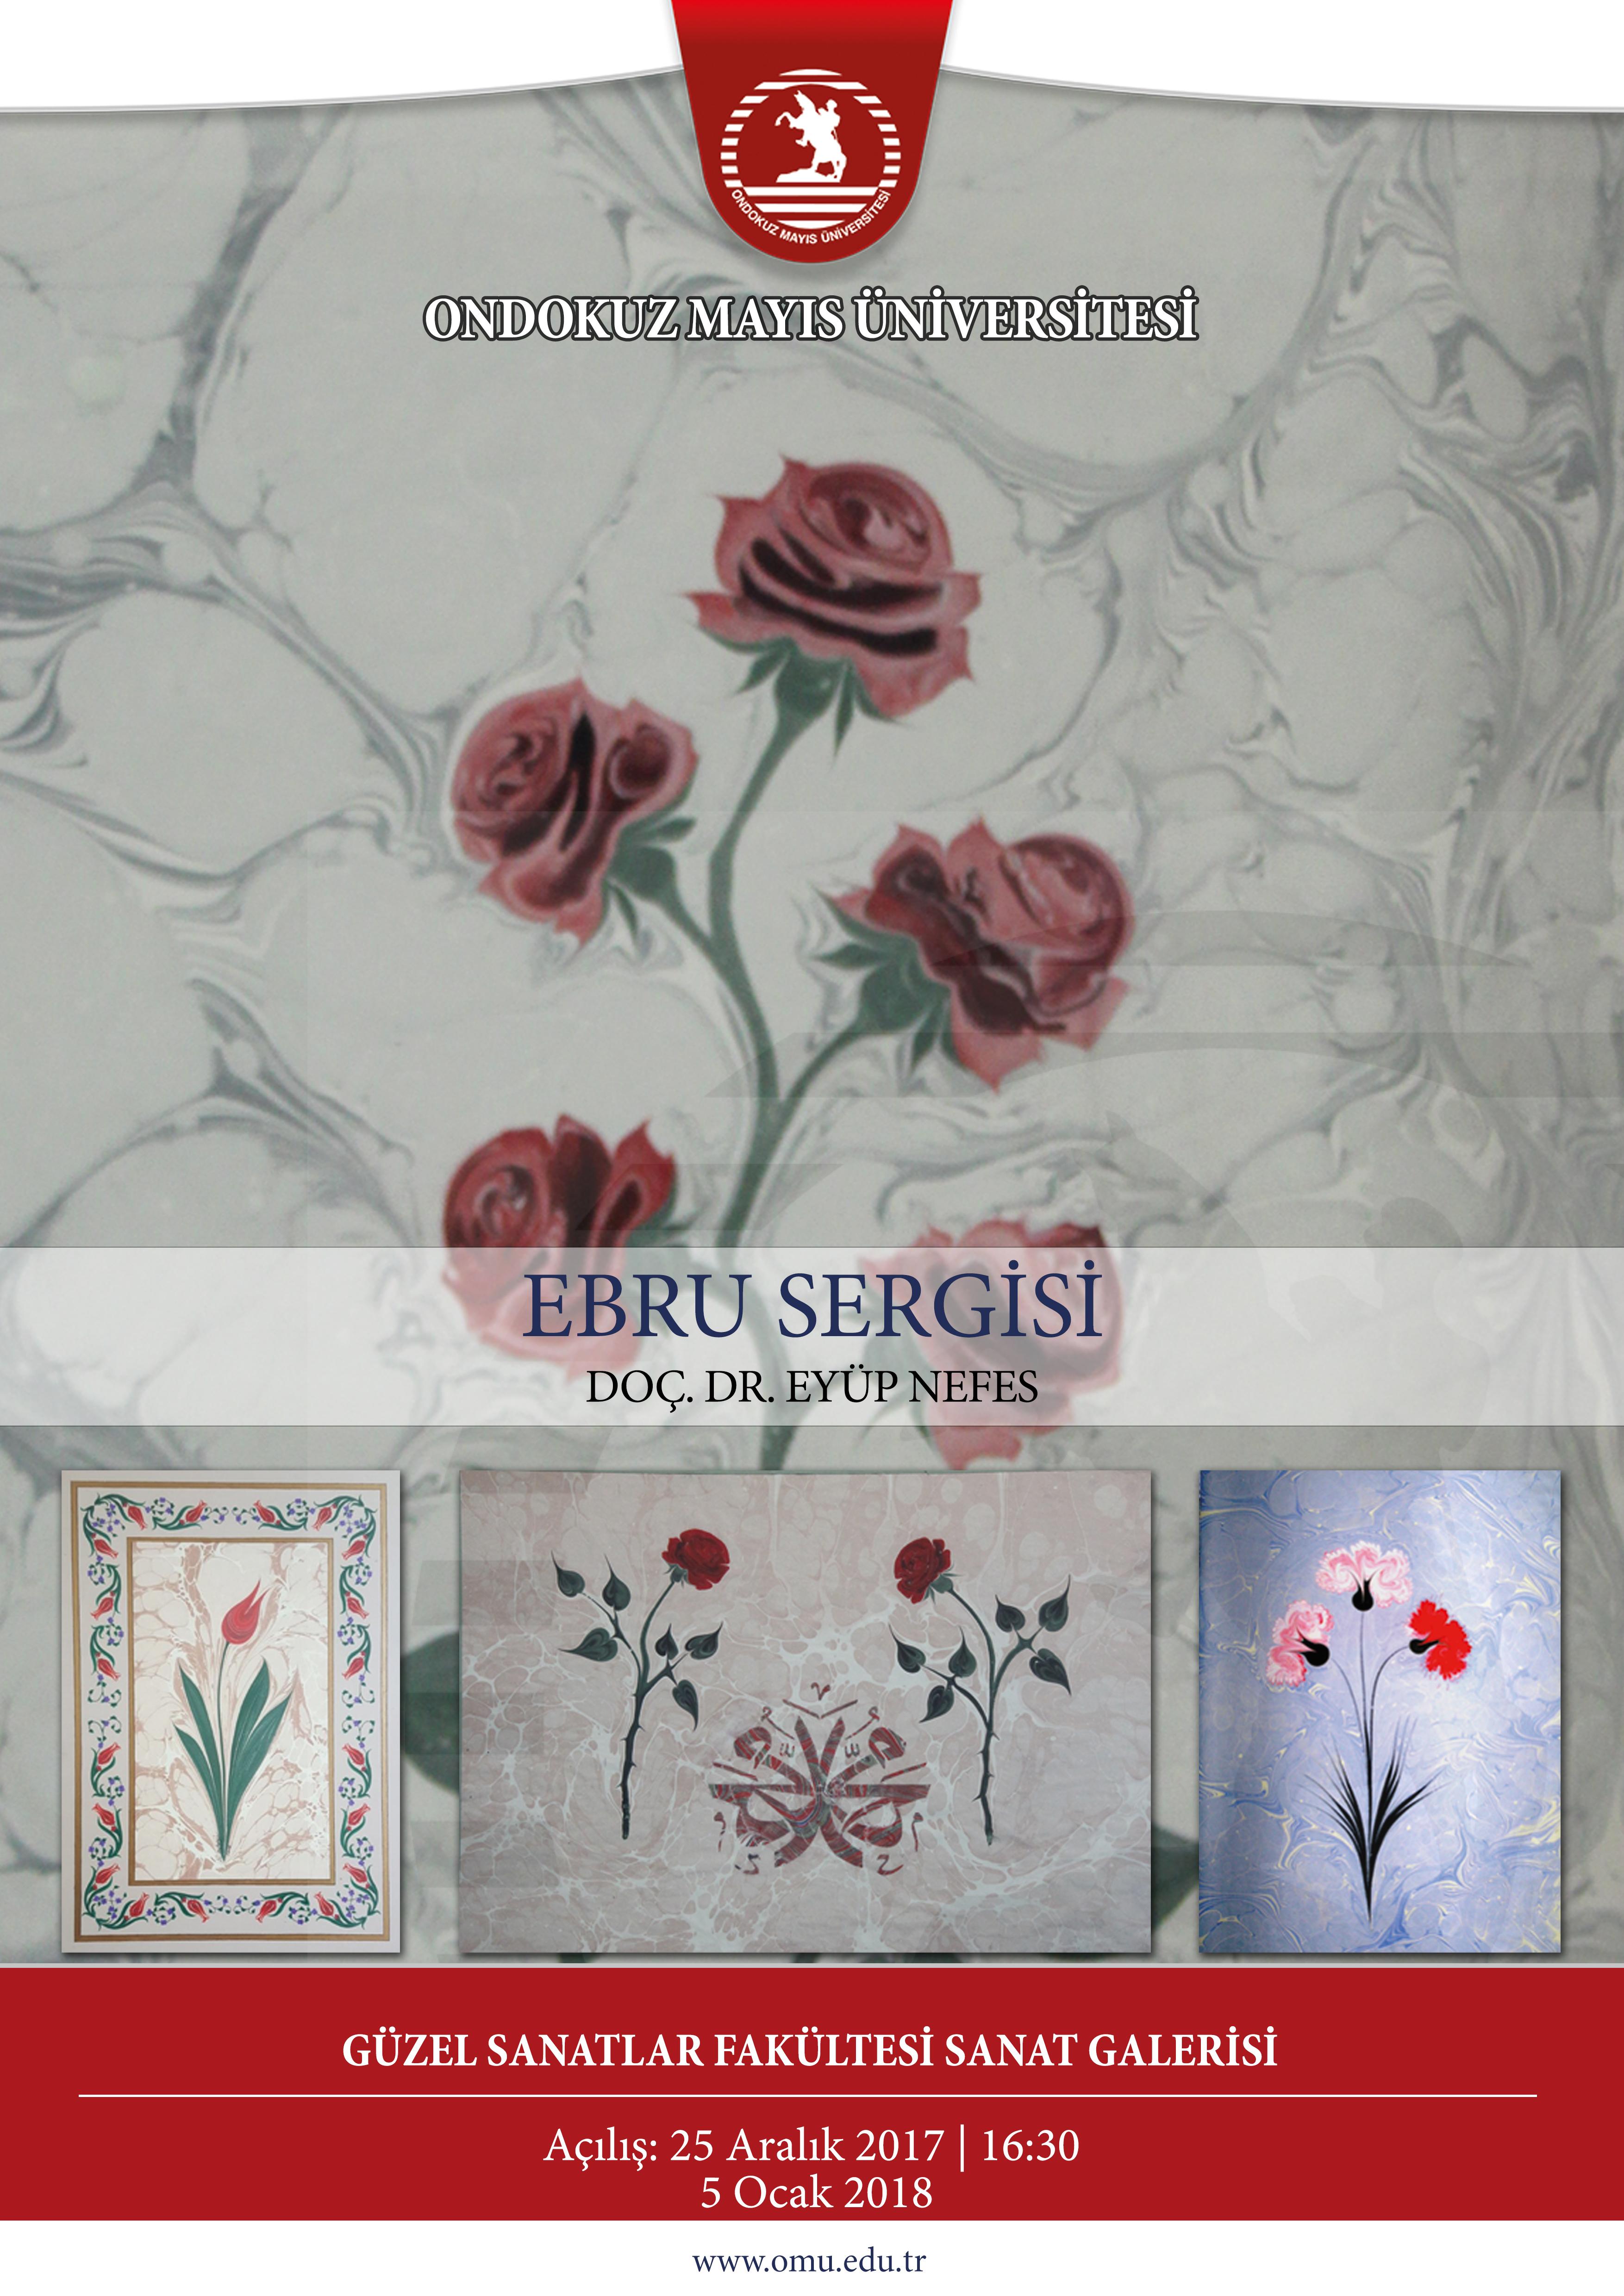 http://www.omu.edu.tr/sites/default/files/ebru_sergisia3.jpg